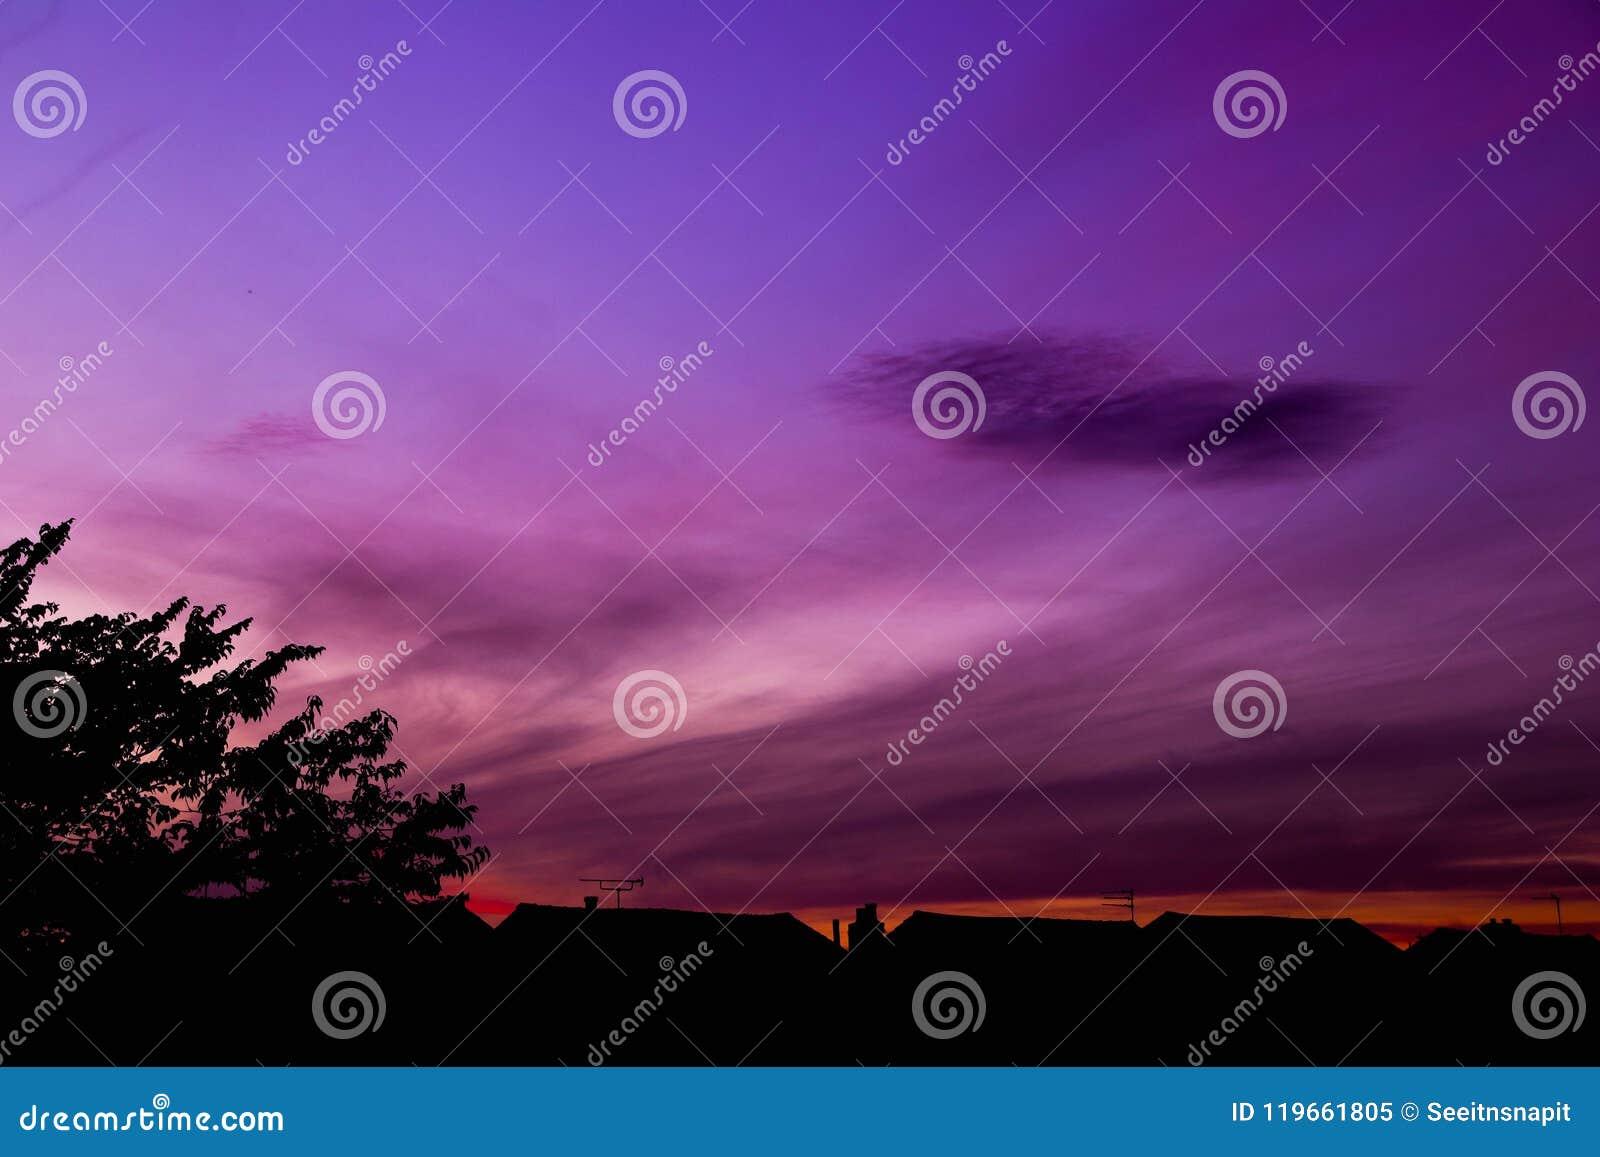 Crepúsculo com nuvens